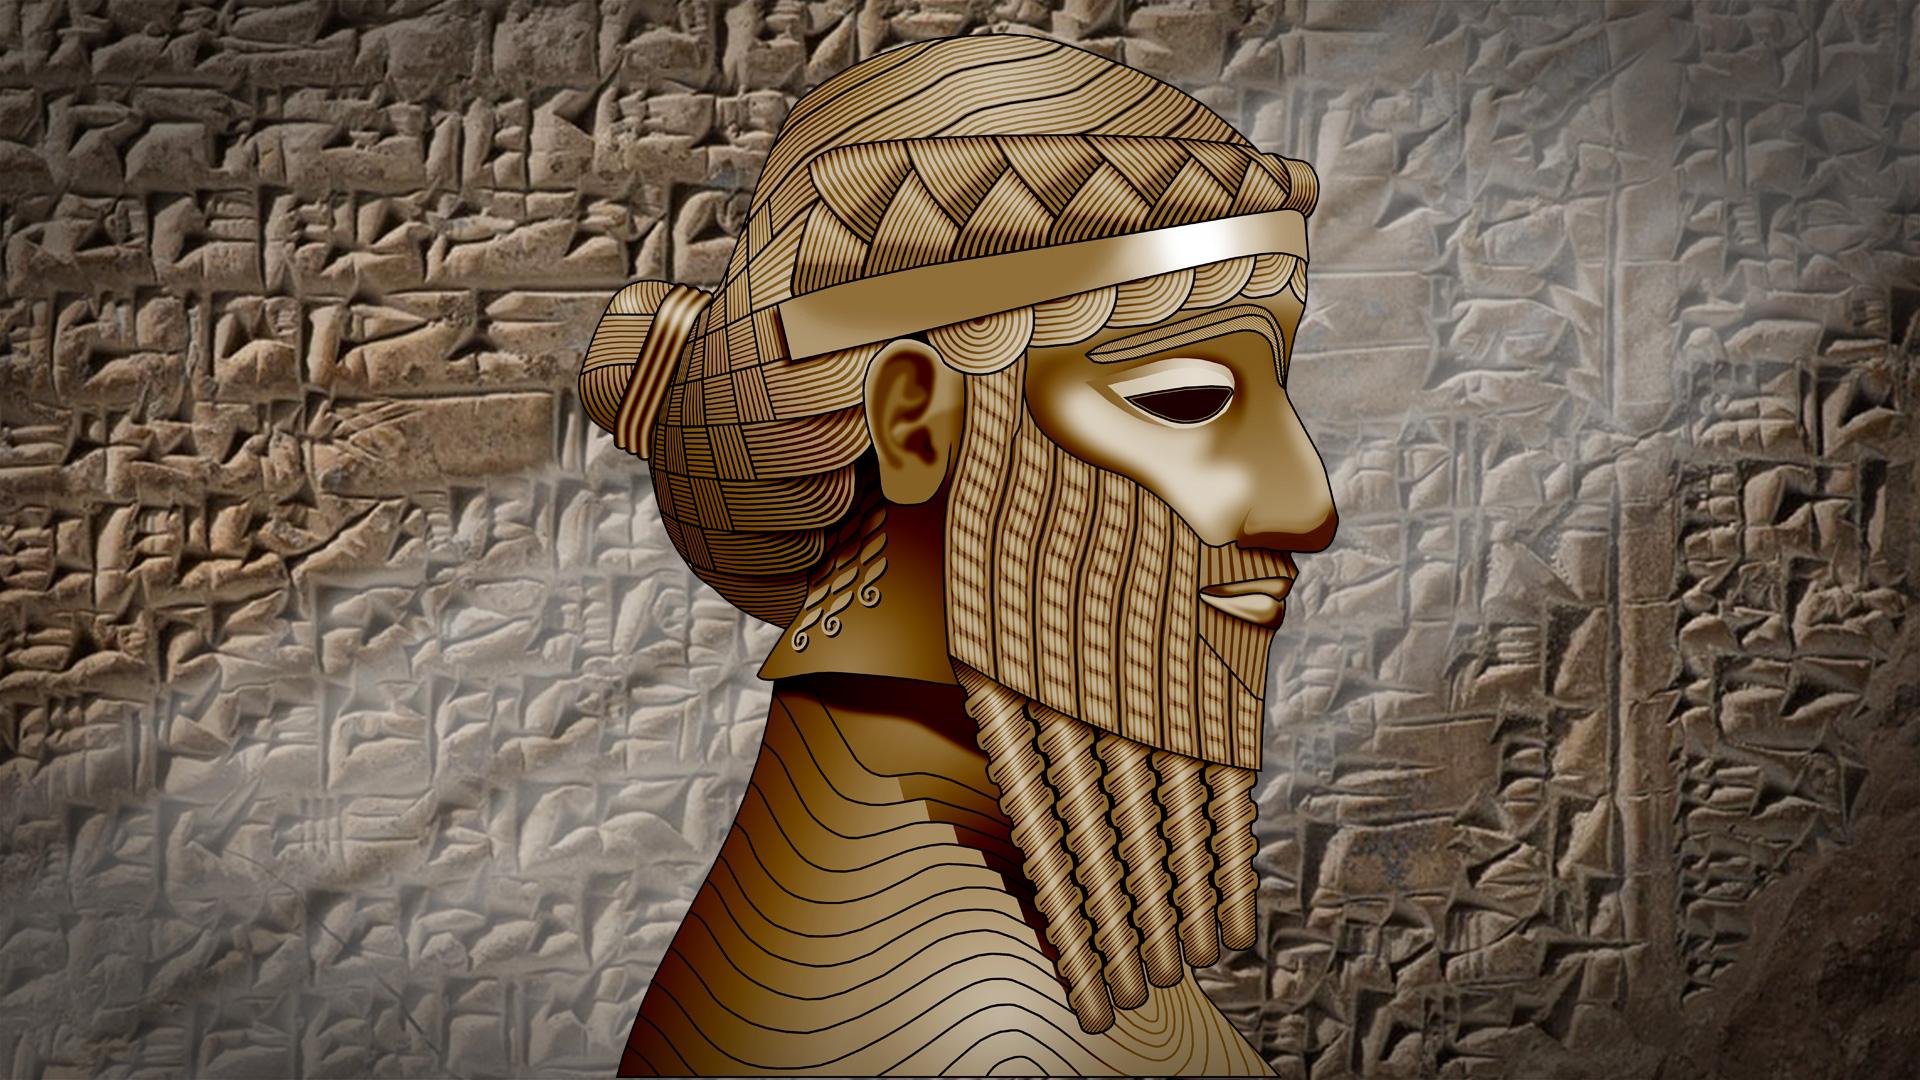 Sumerian Ancient Aliens Anunnaki Propaganda In Mesopotamia 1920x1080